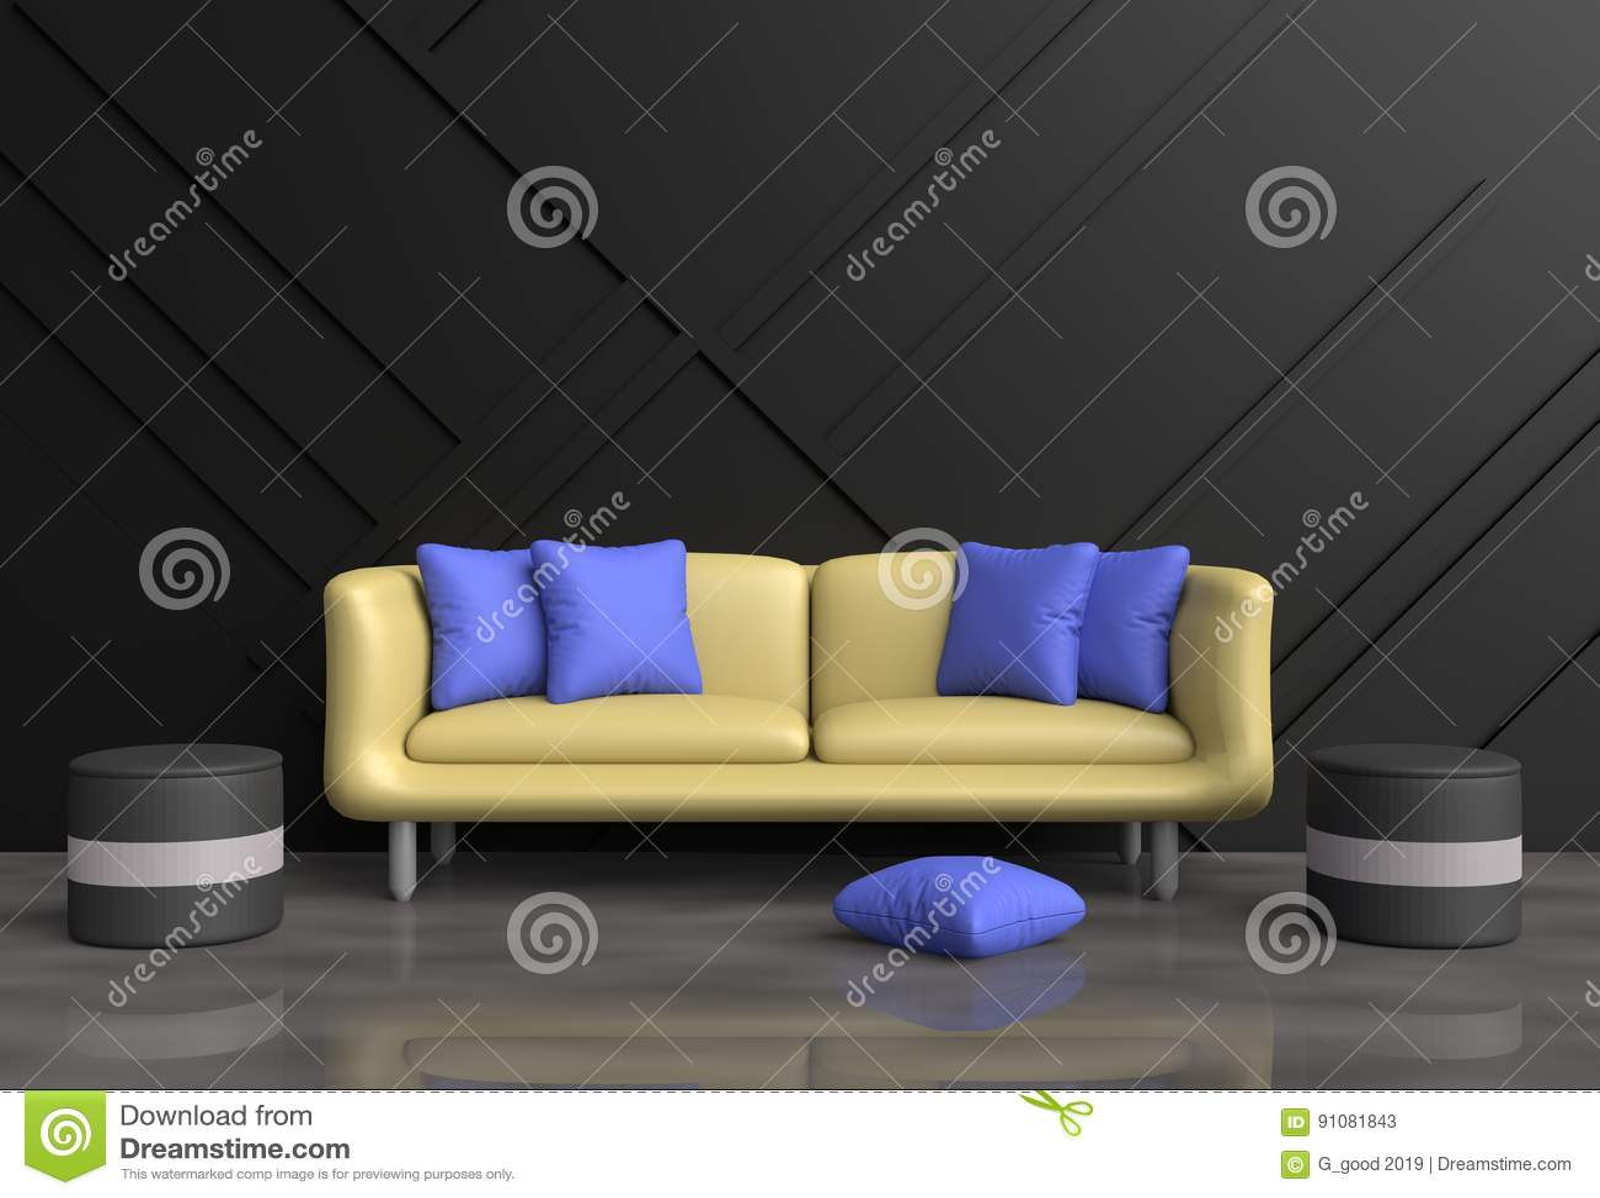 Elegant Purple and Grey Living Room Furniture